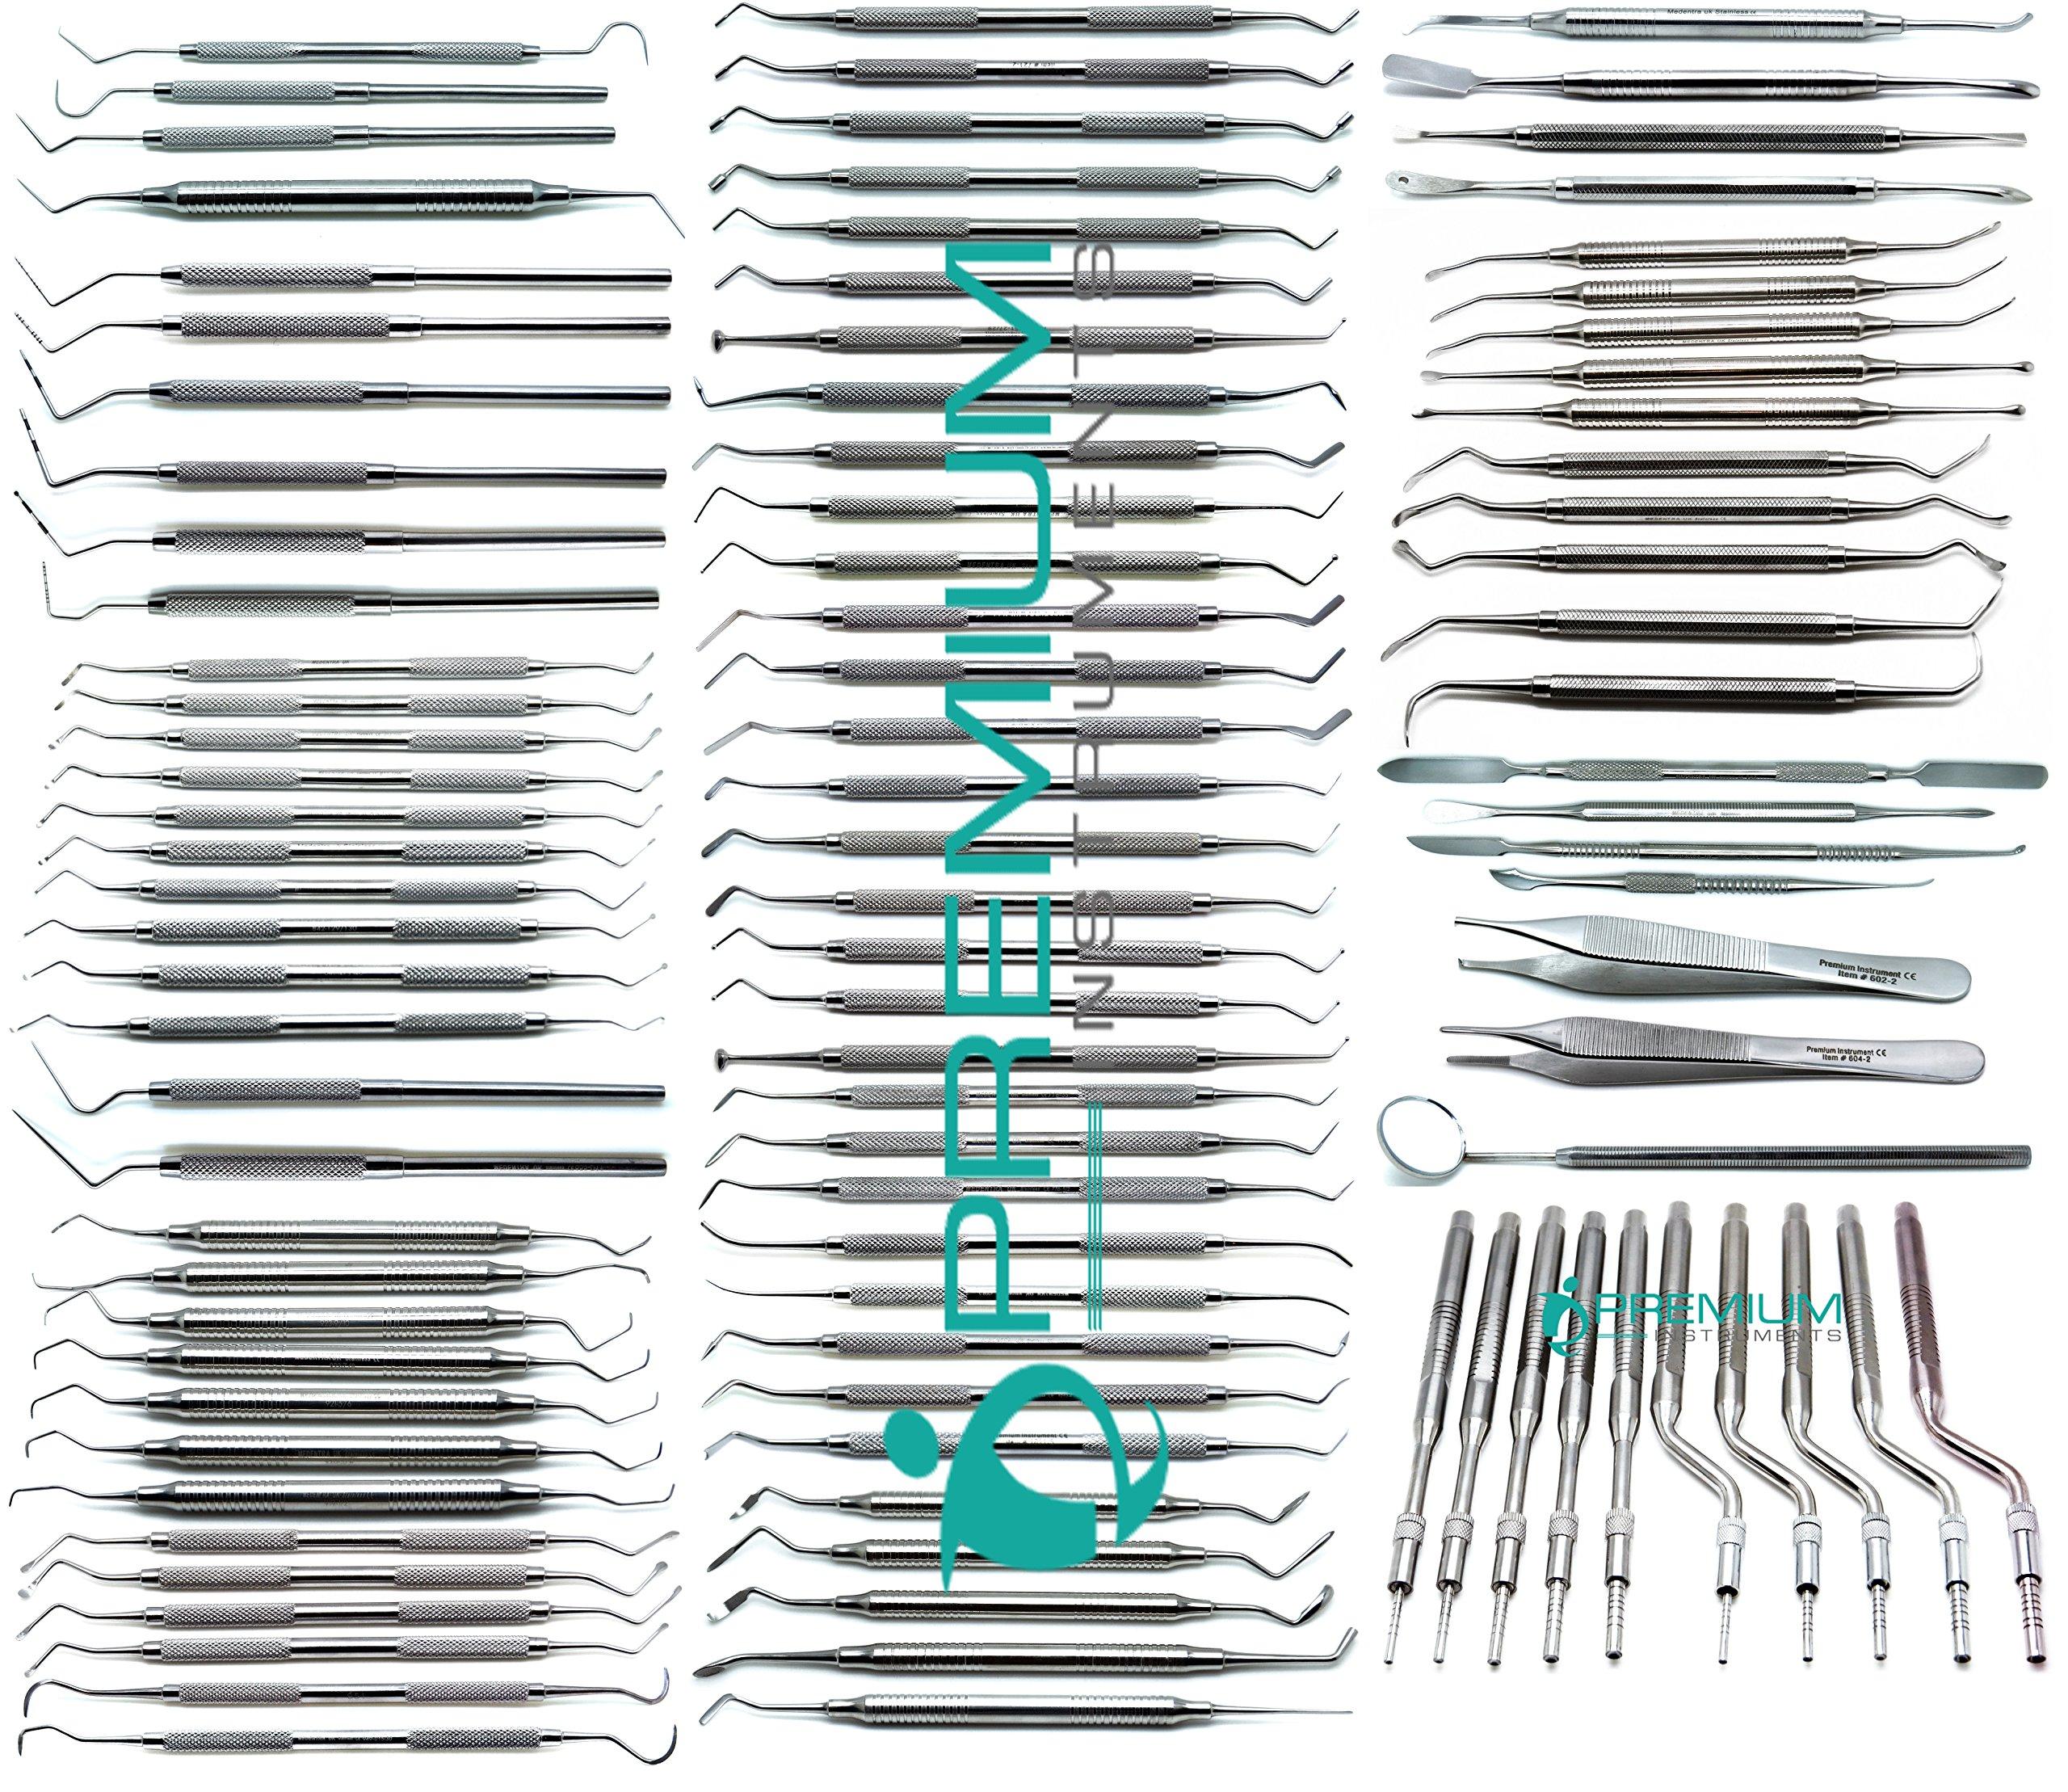 Dental Student Examination Explorers, Curettes, Osteotomes, Sinus Lift, Probes, Excavators, Scalers, Filling, Periosteals, Tweezers Instruments 100 Pcs